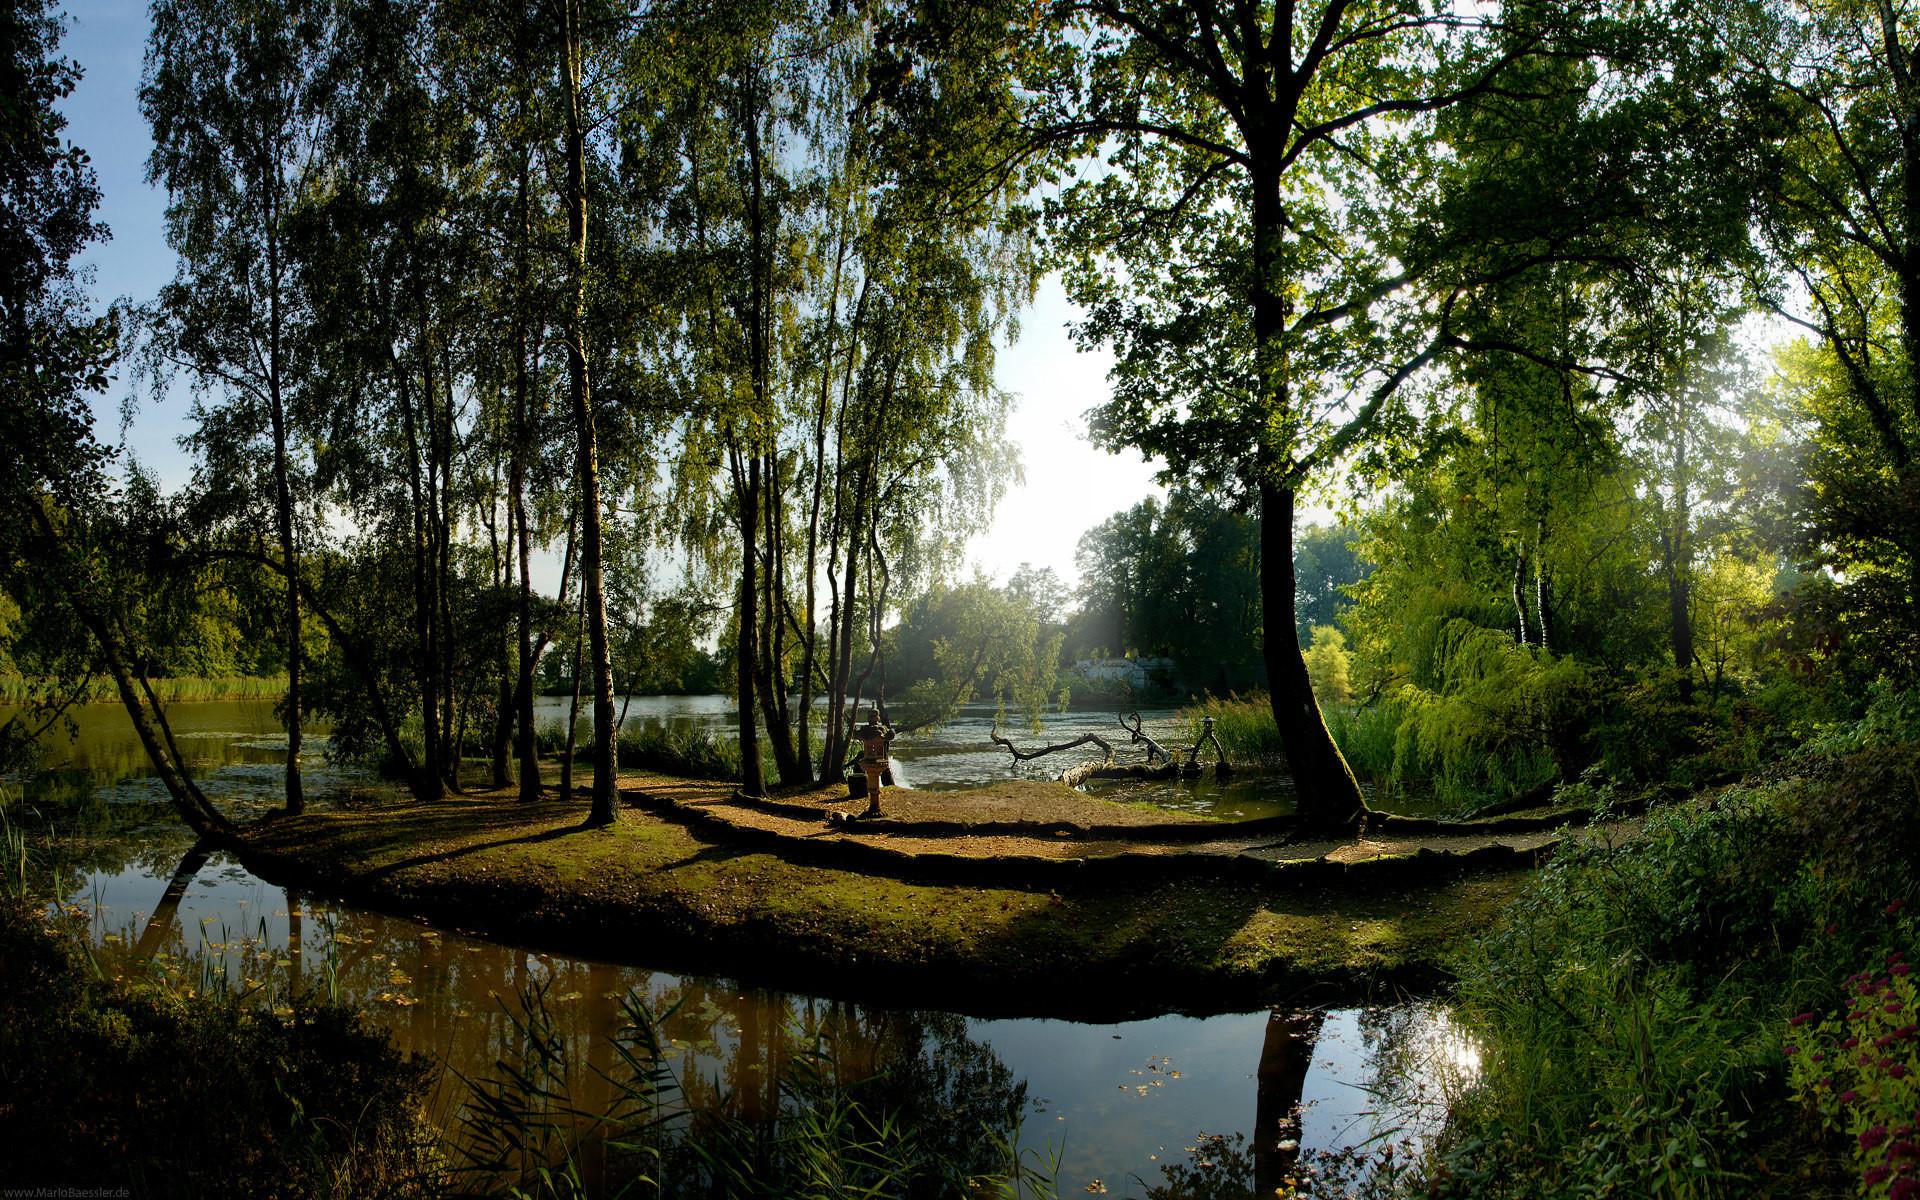 Nexus Desktop Wallpaper Nature Forests – WallpaperSafari